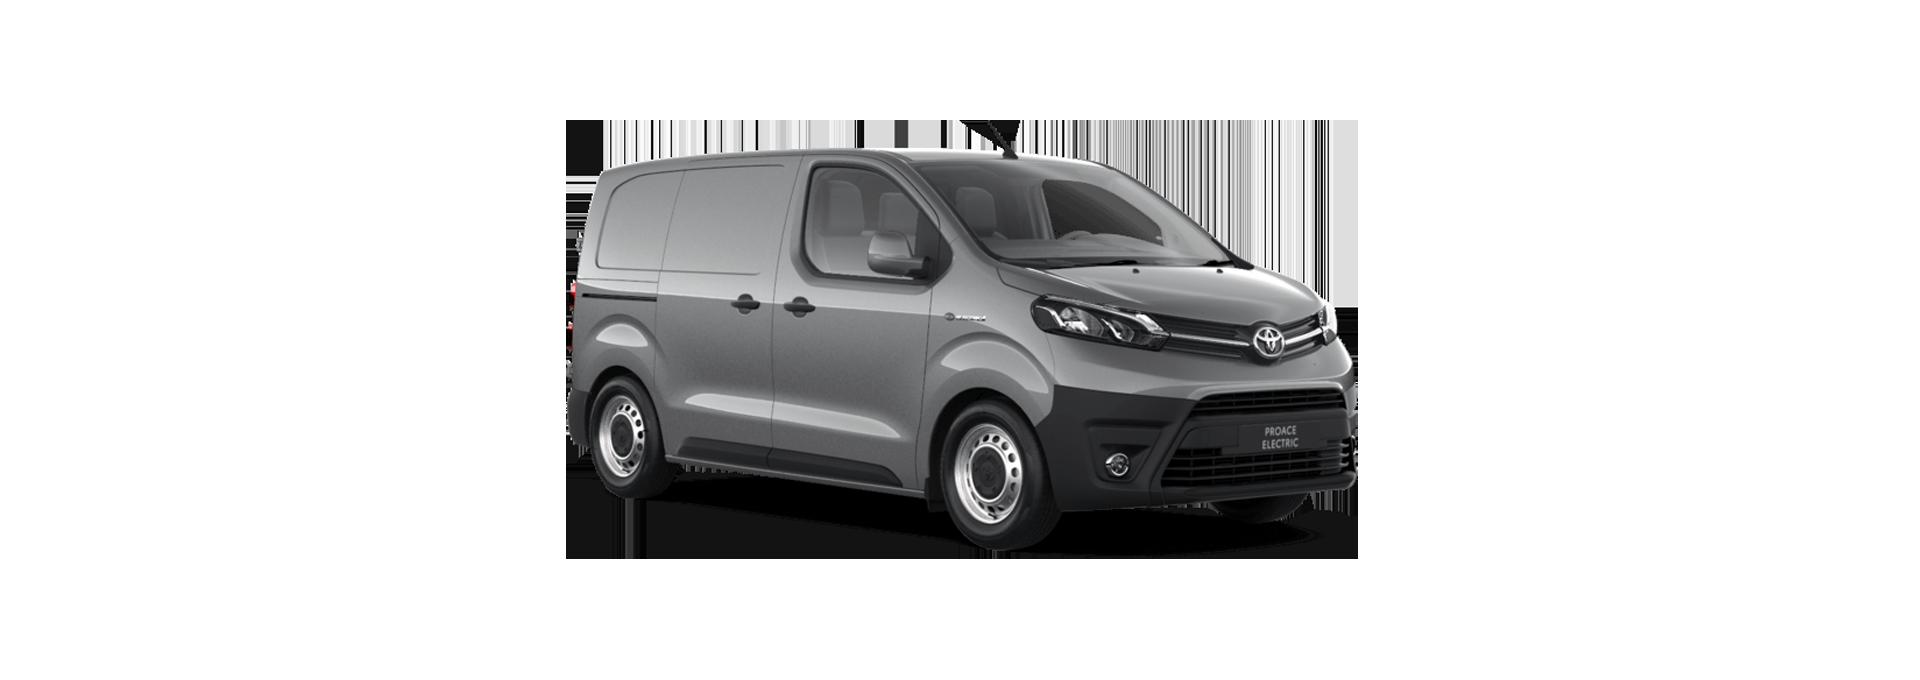 Toyota Nuevo Proace Electric